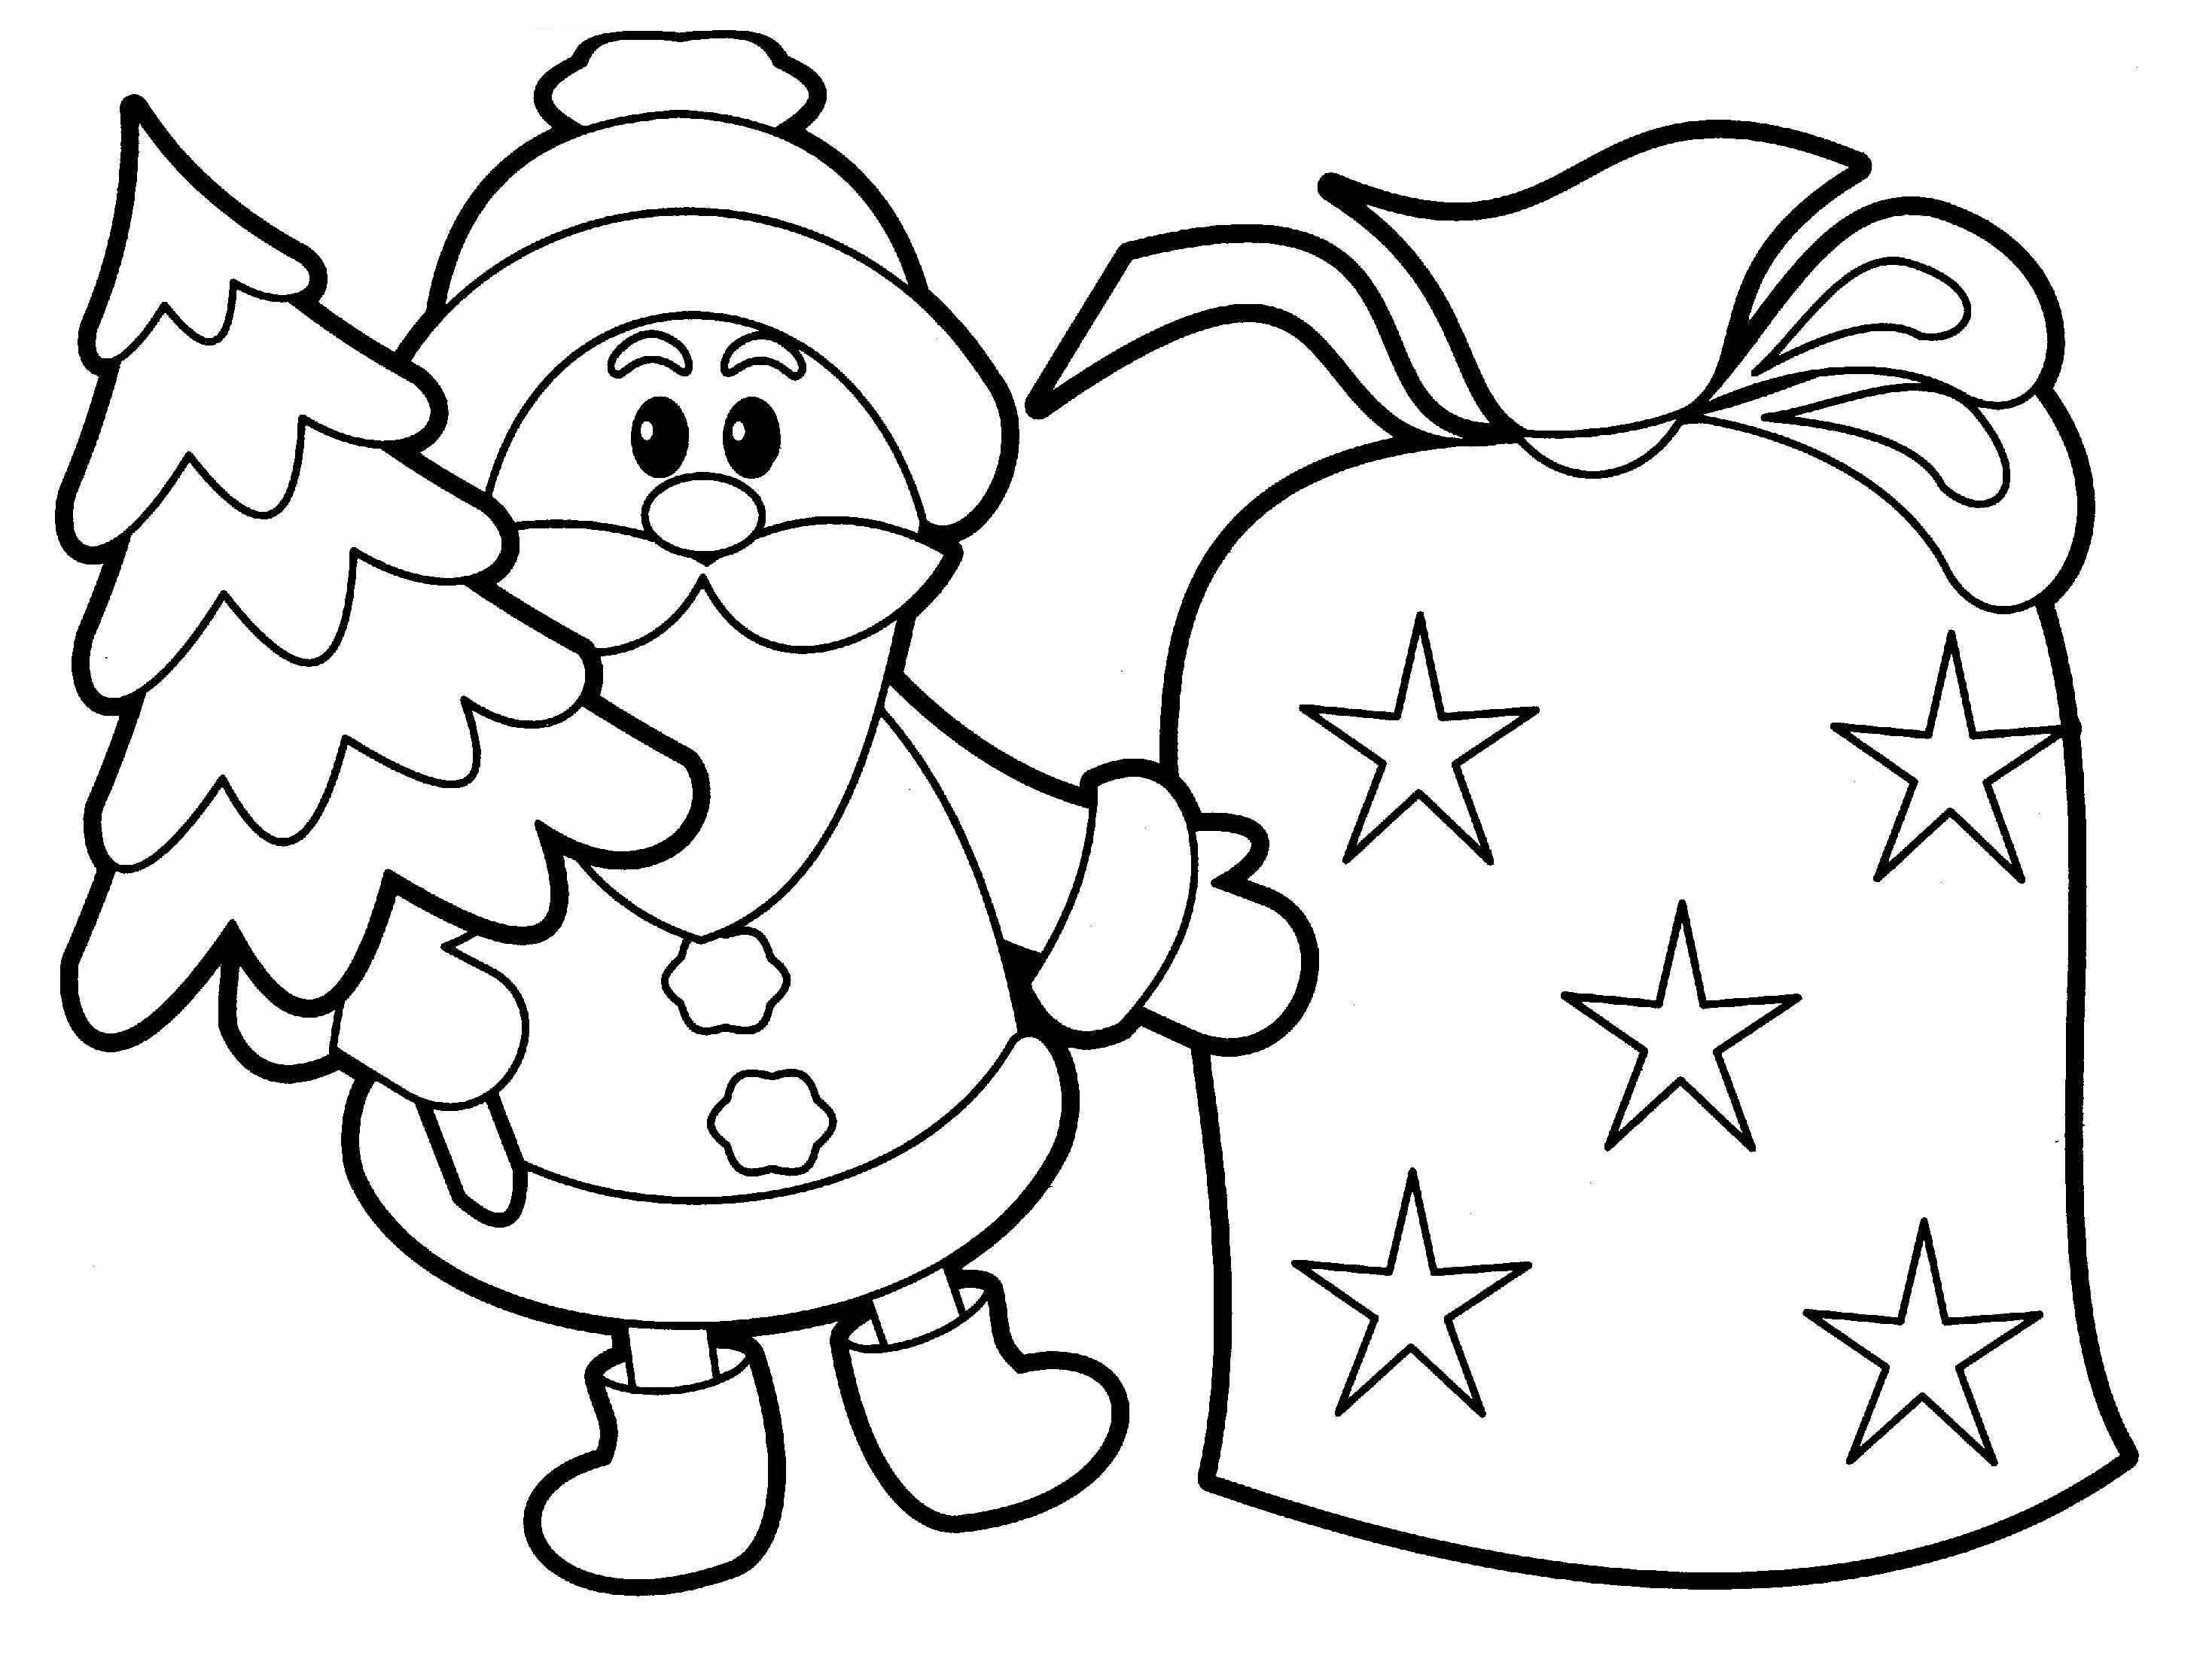 Christmas Coloring Pages (3) | ♢Christmas Coloring Pages ...